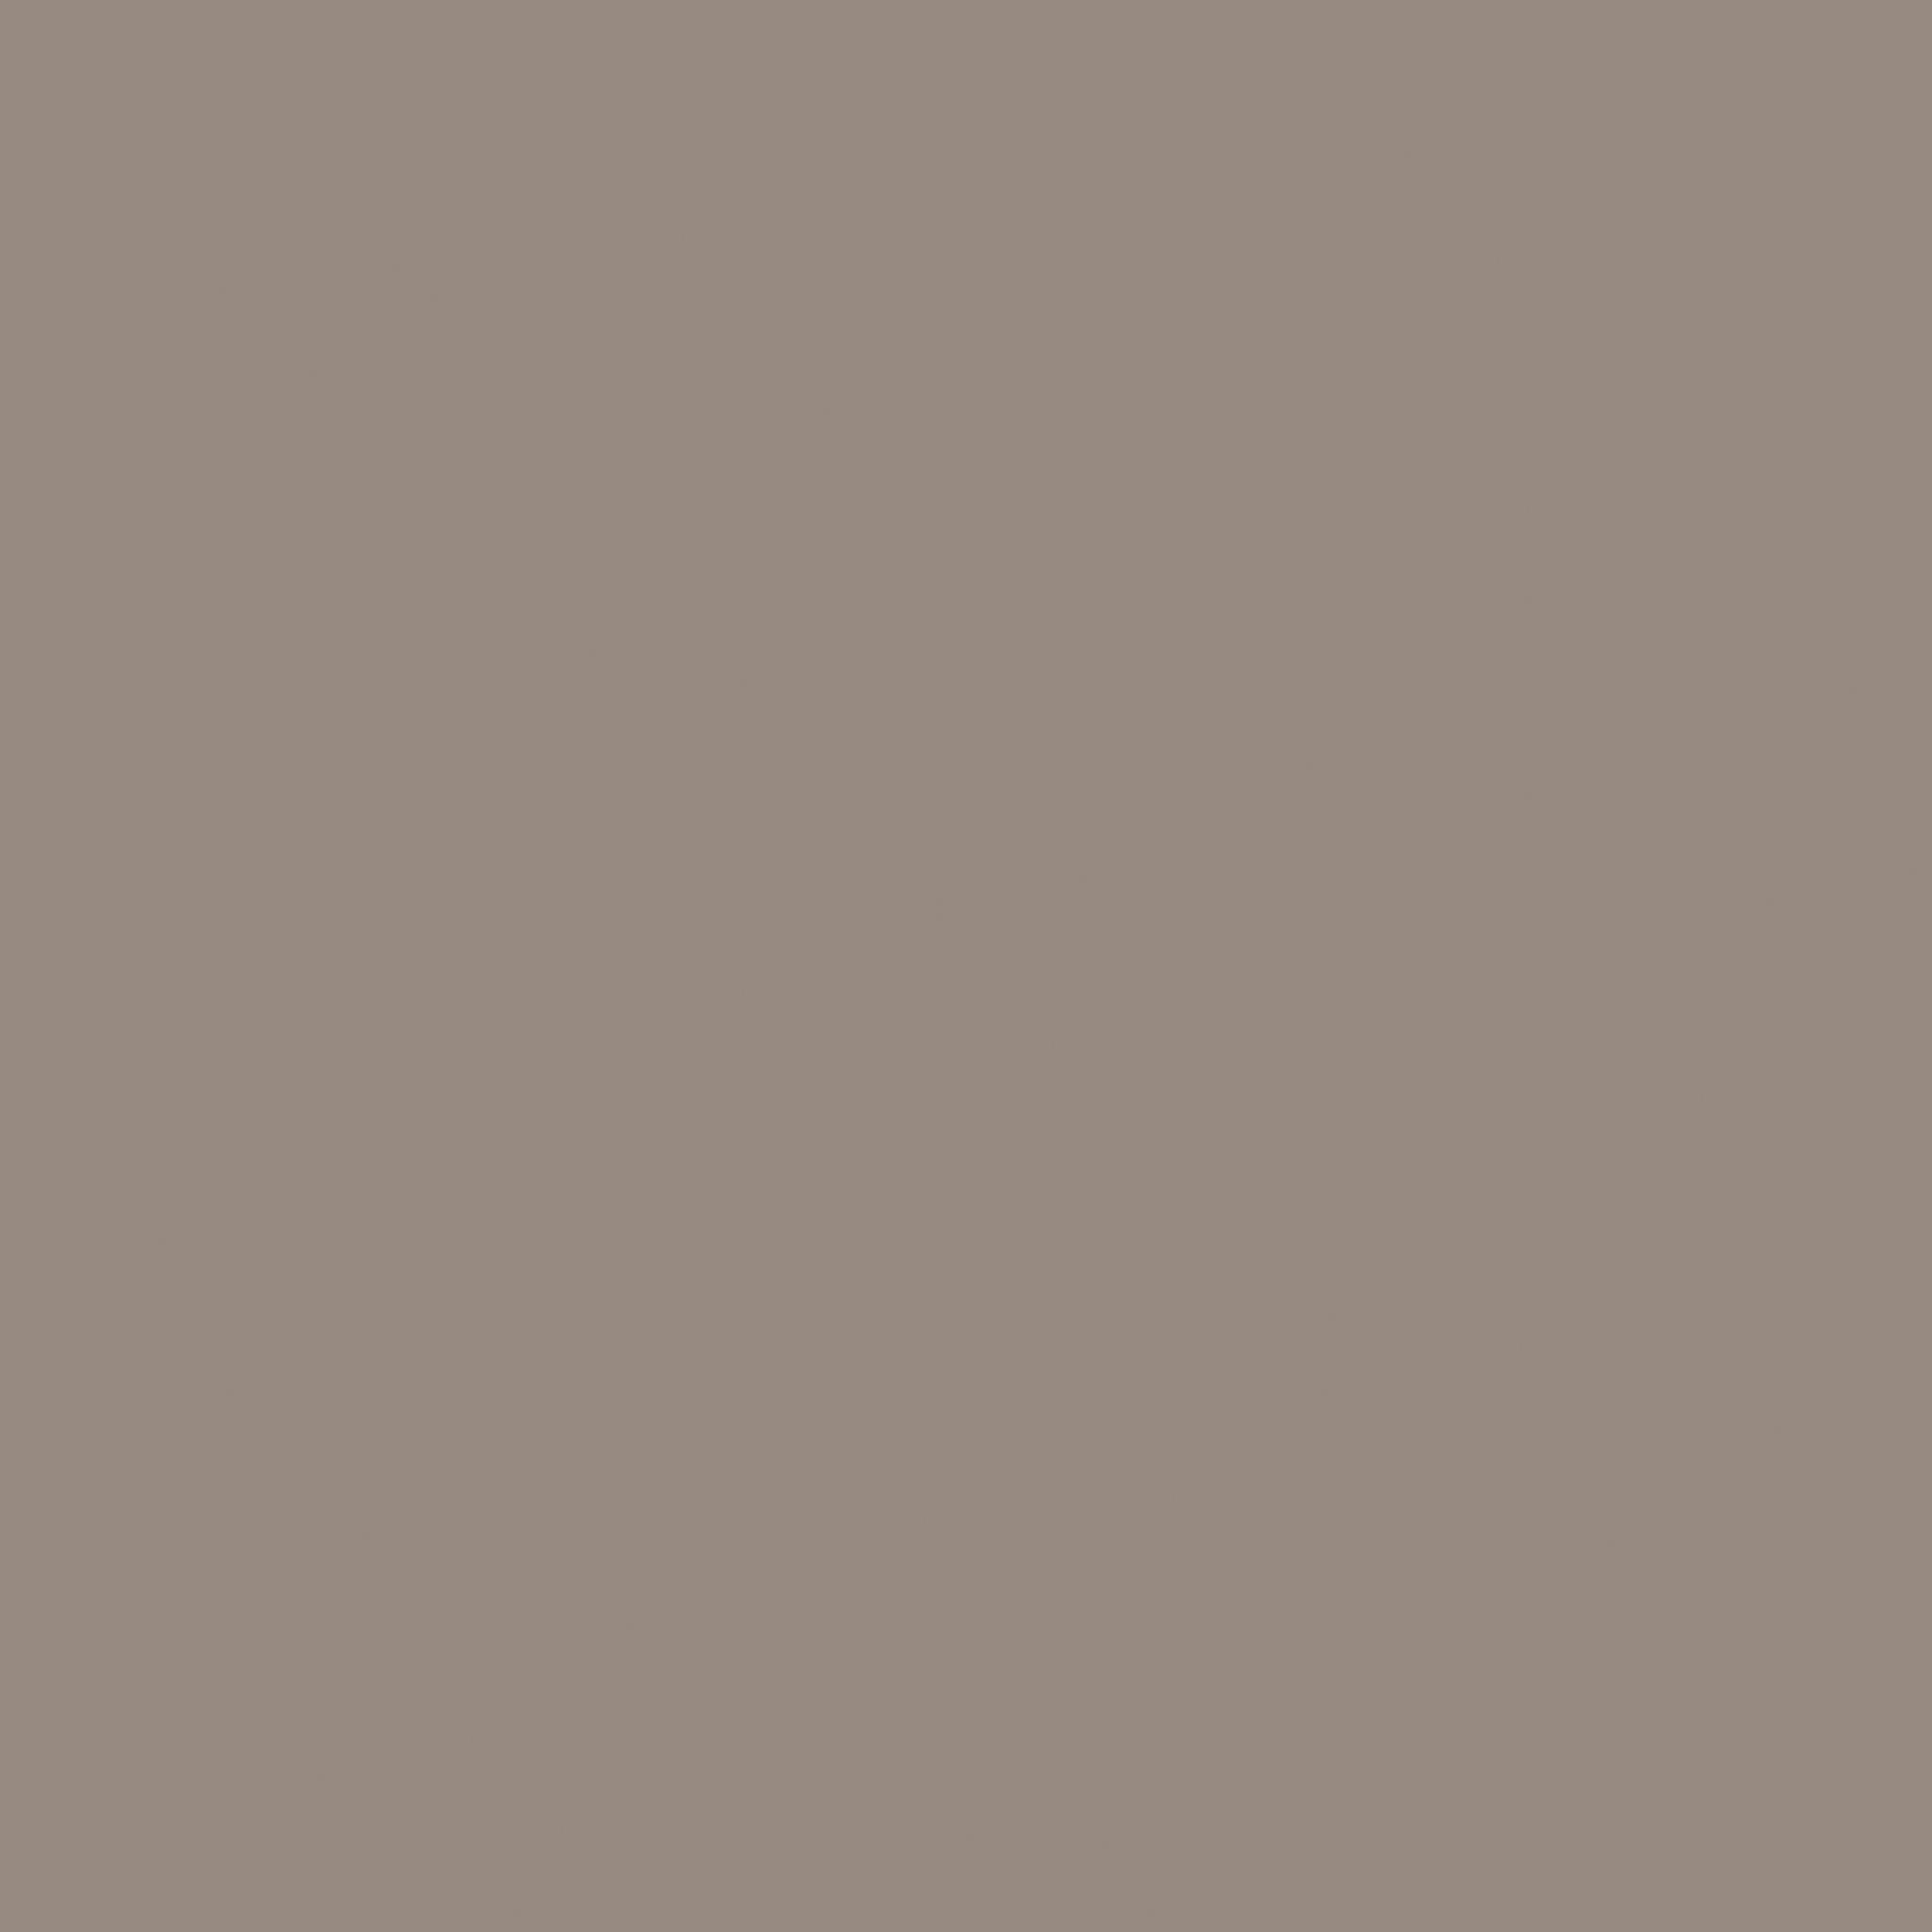 Stone Grey 16002 (M)